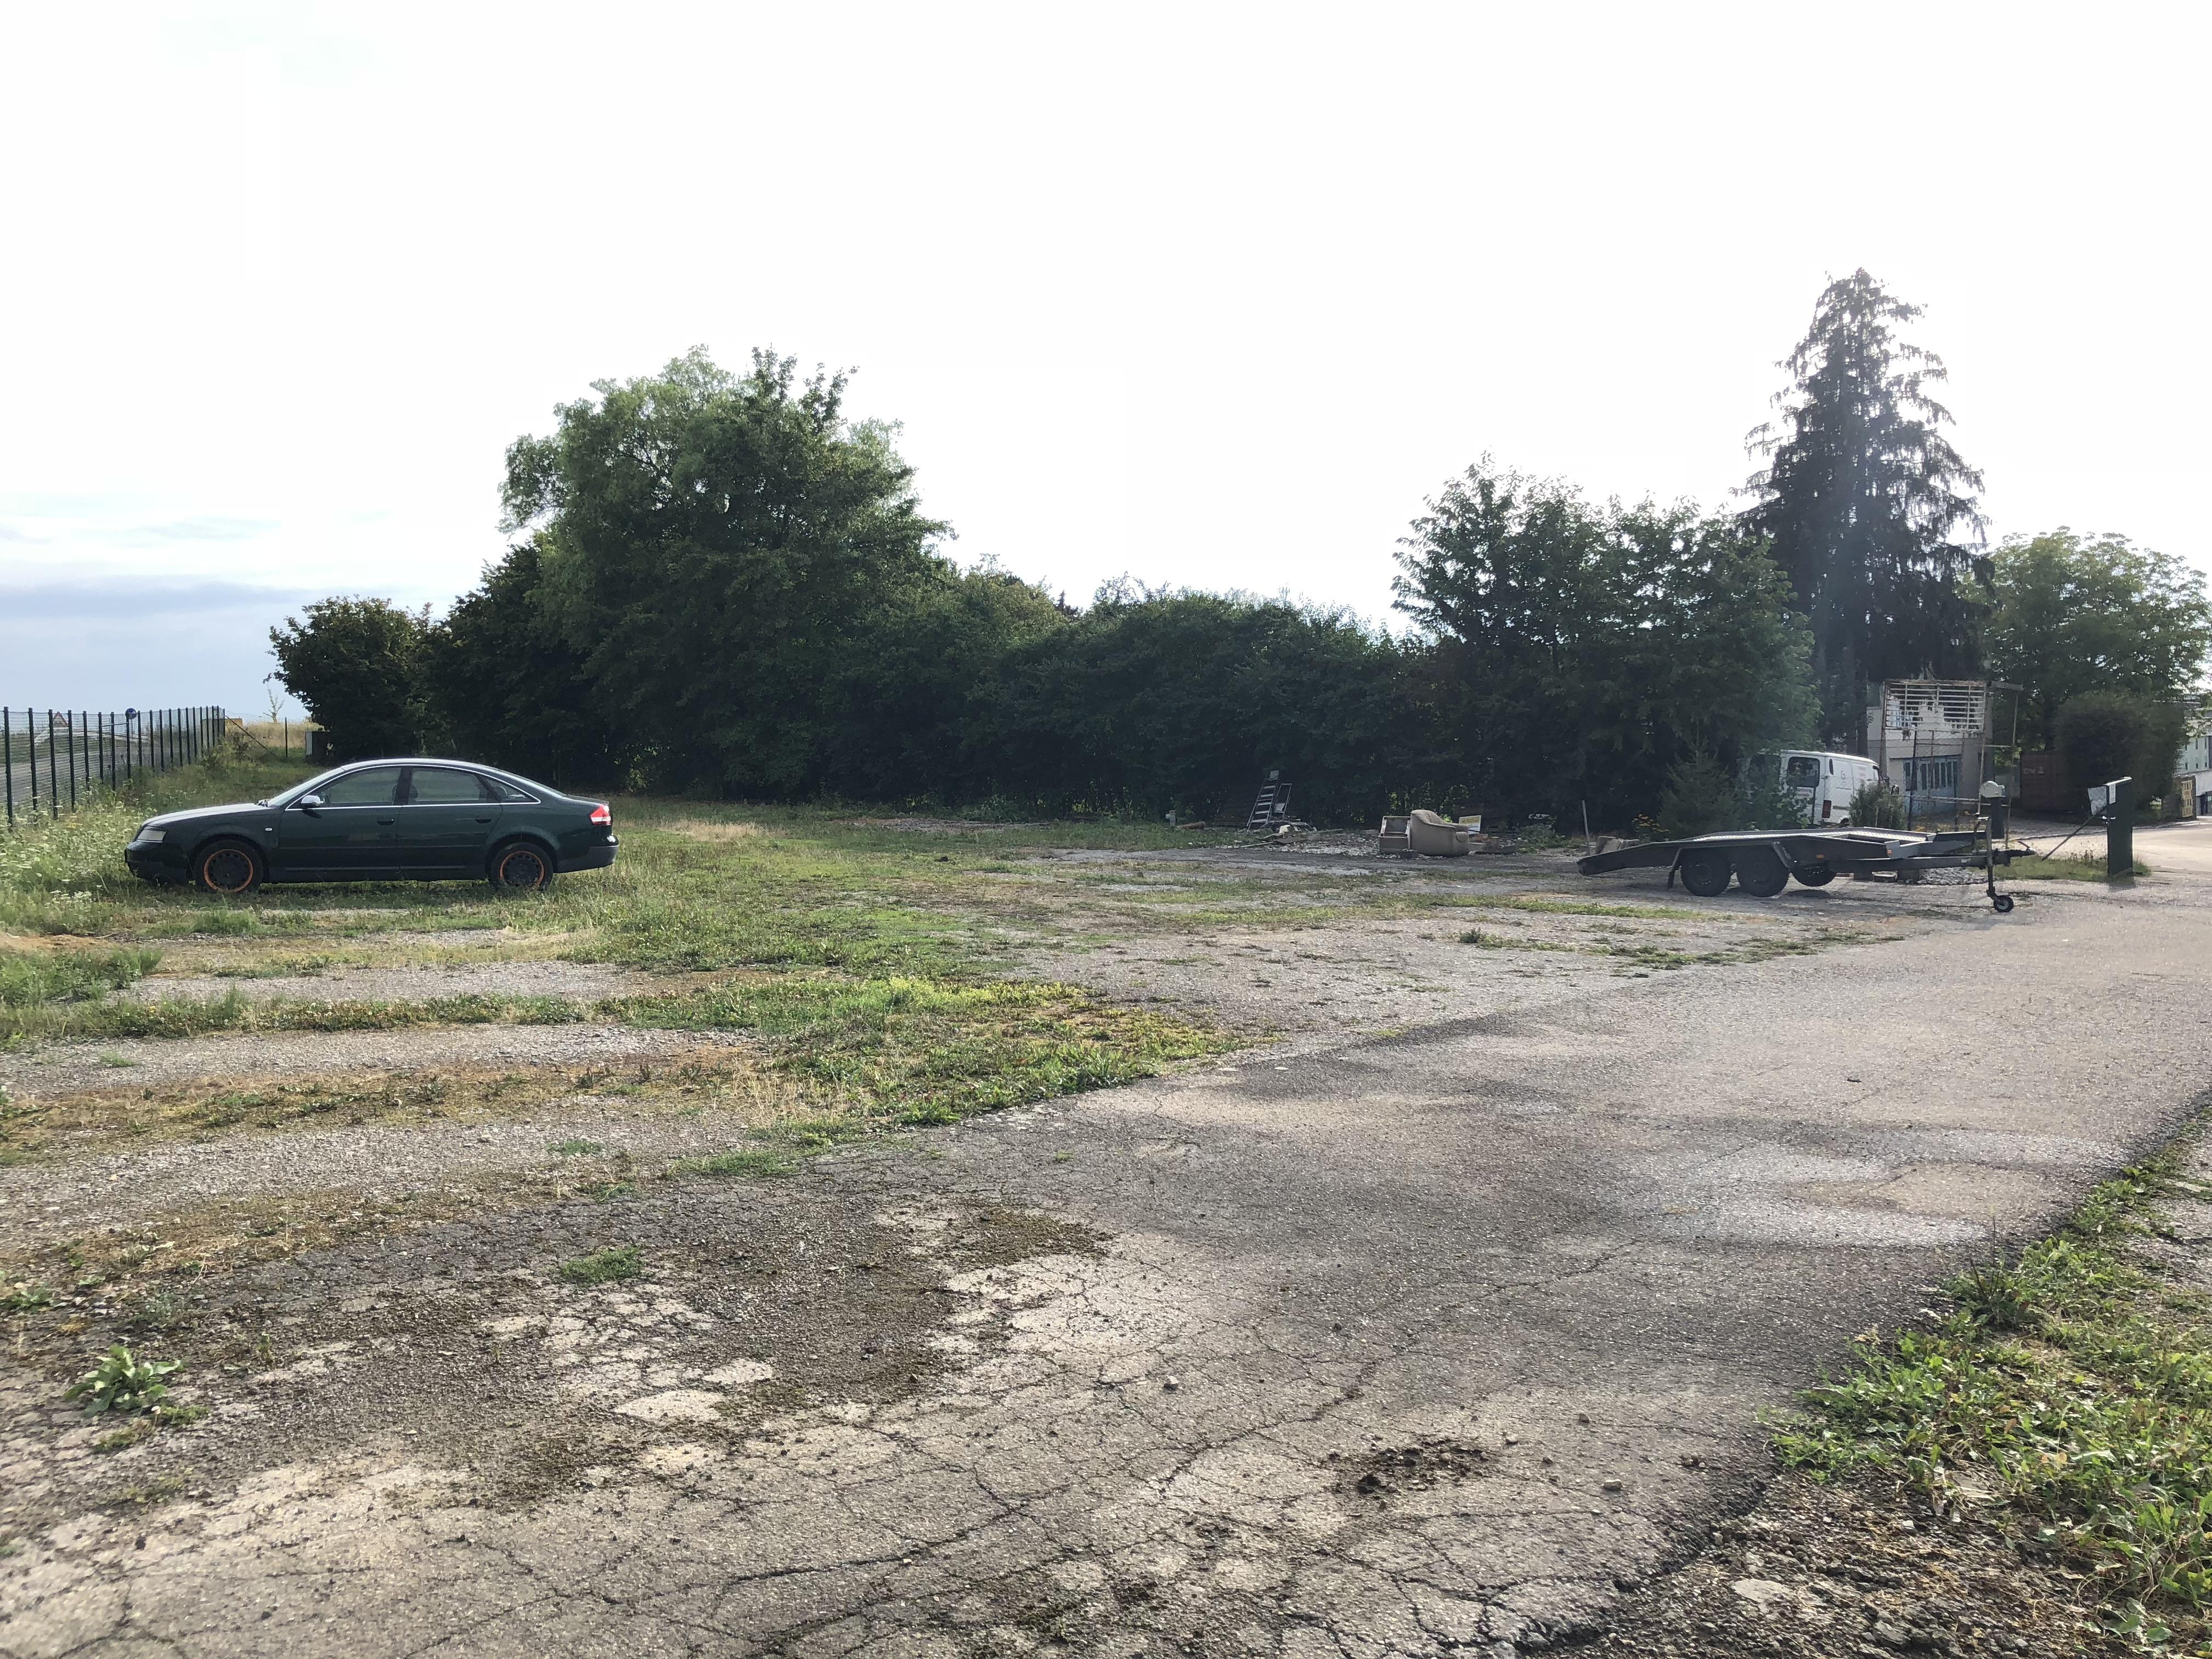 2018-08-09 Grundstück leer (3)